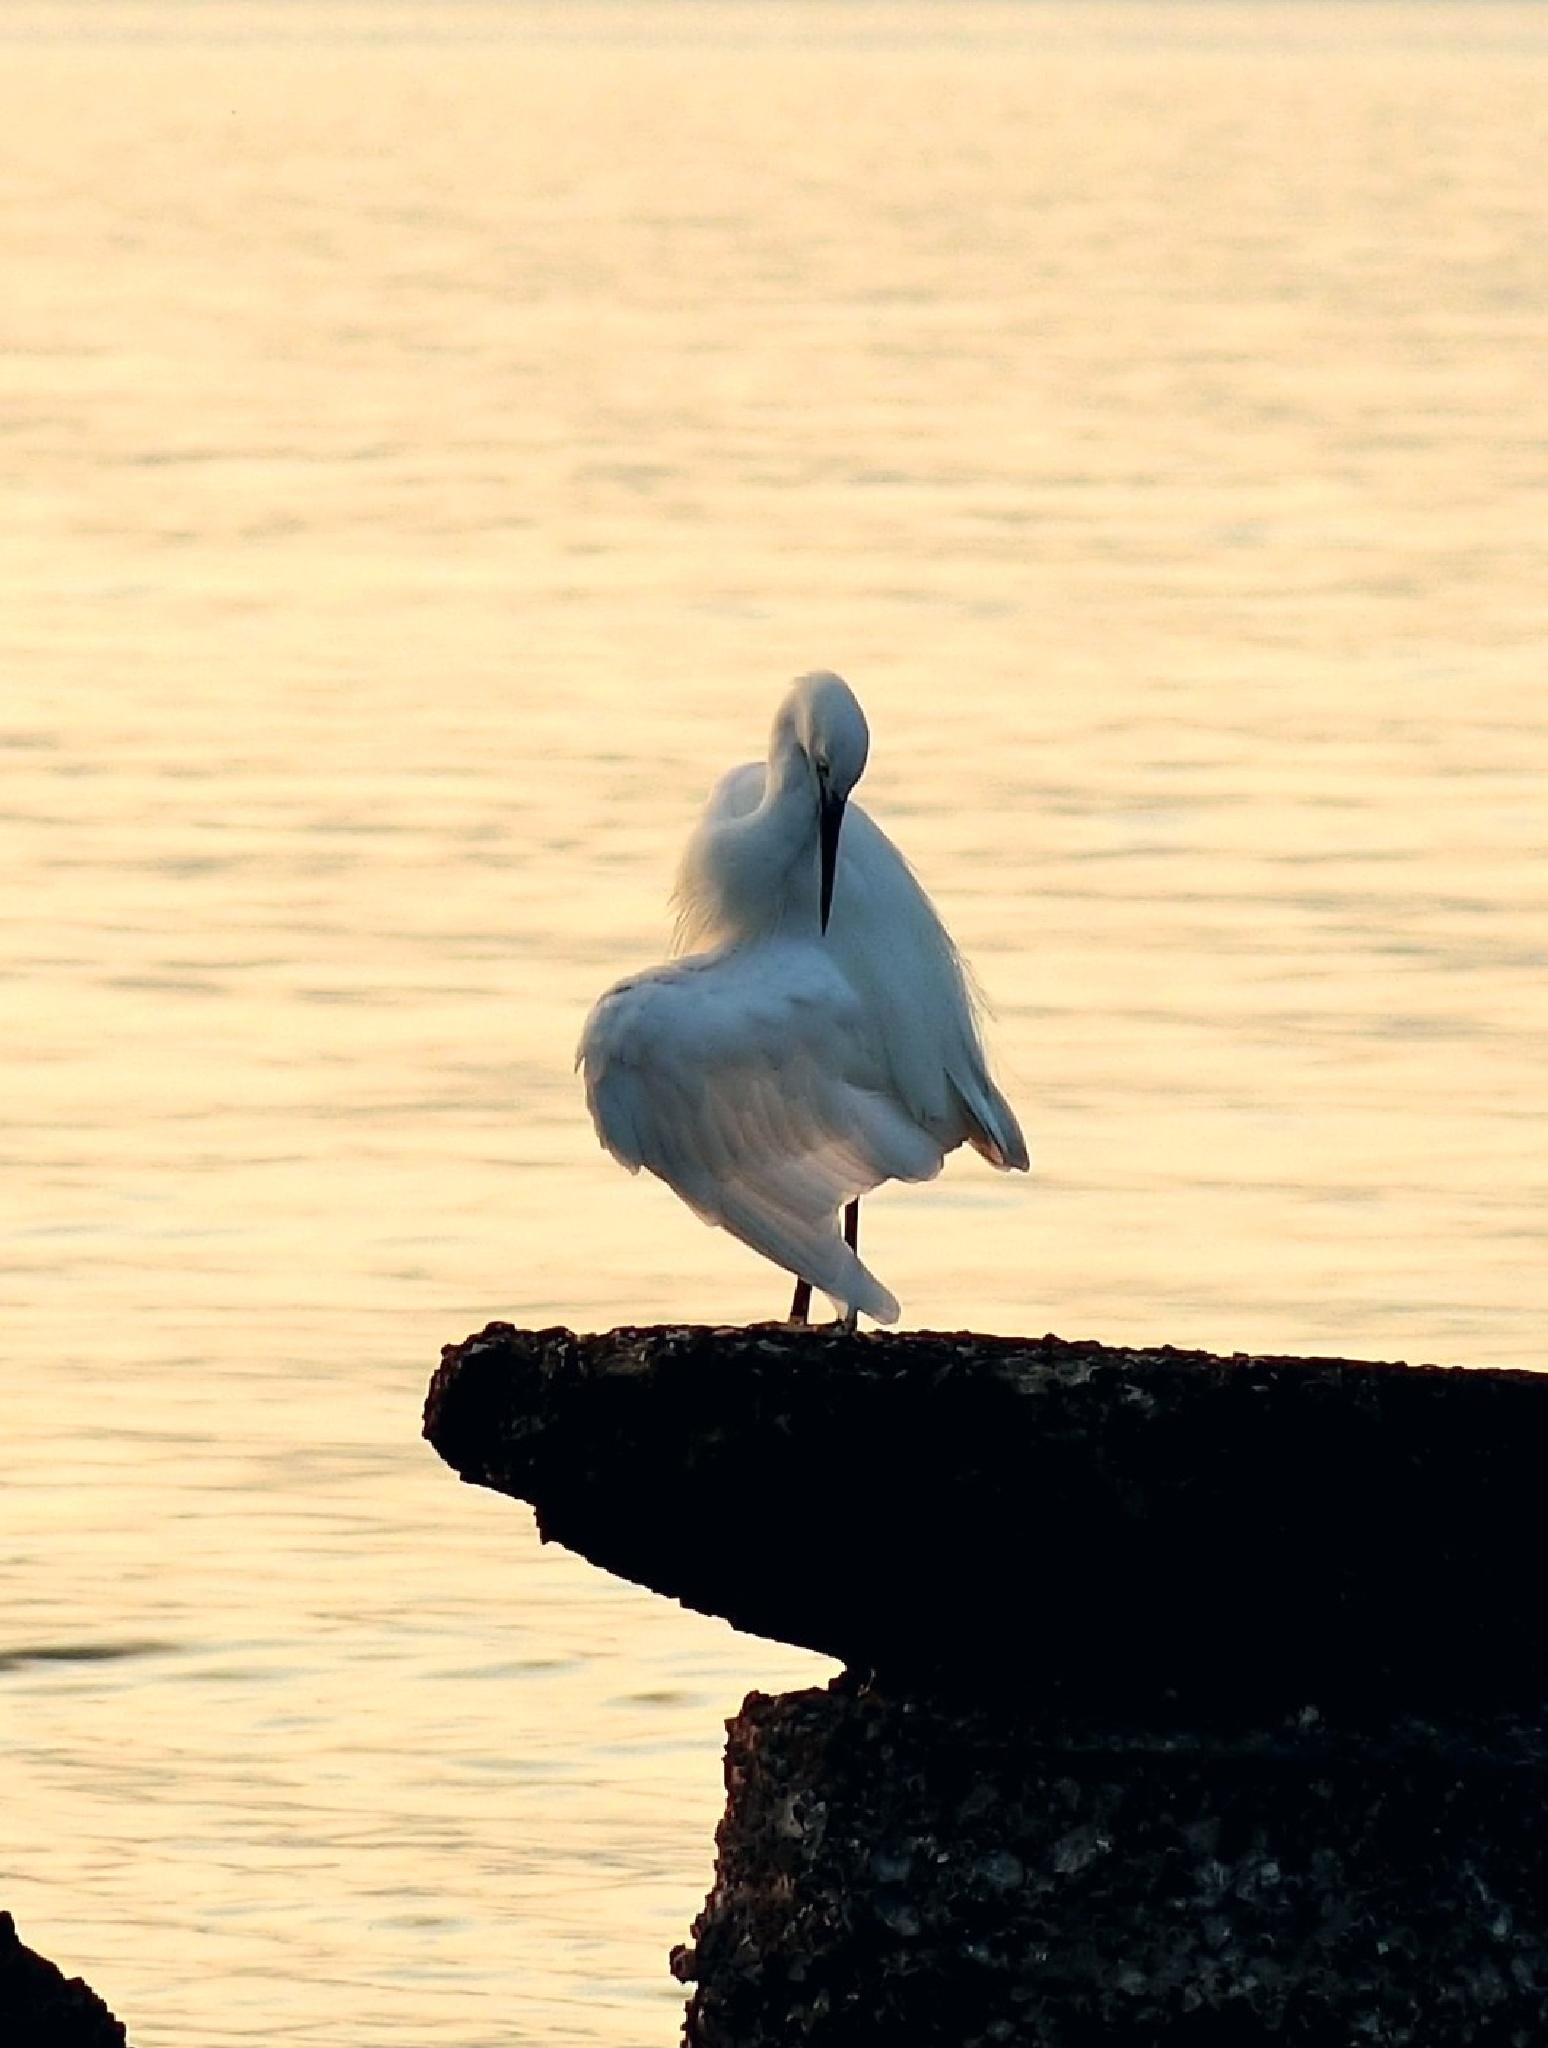 Lone egret at sunset, Wu Kai Sha by pop88123